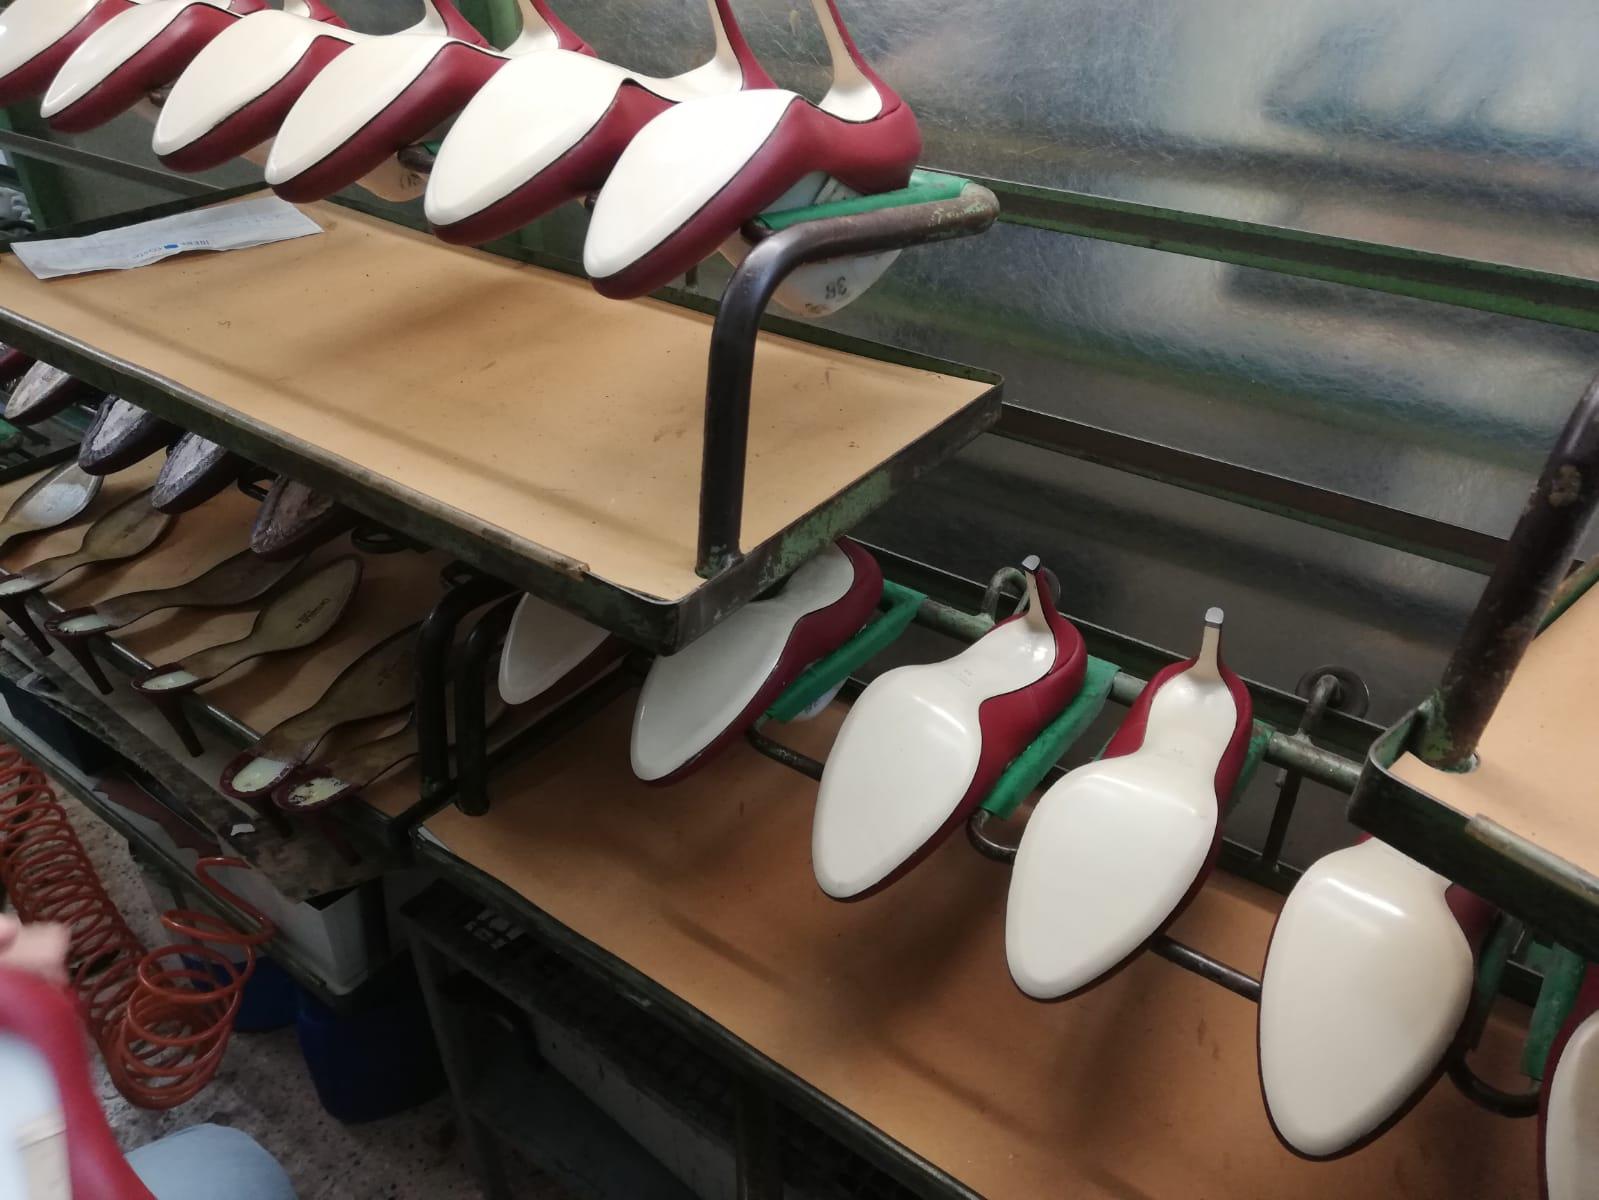 scarpe artigianali made in italy